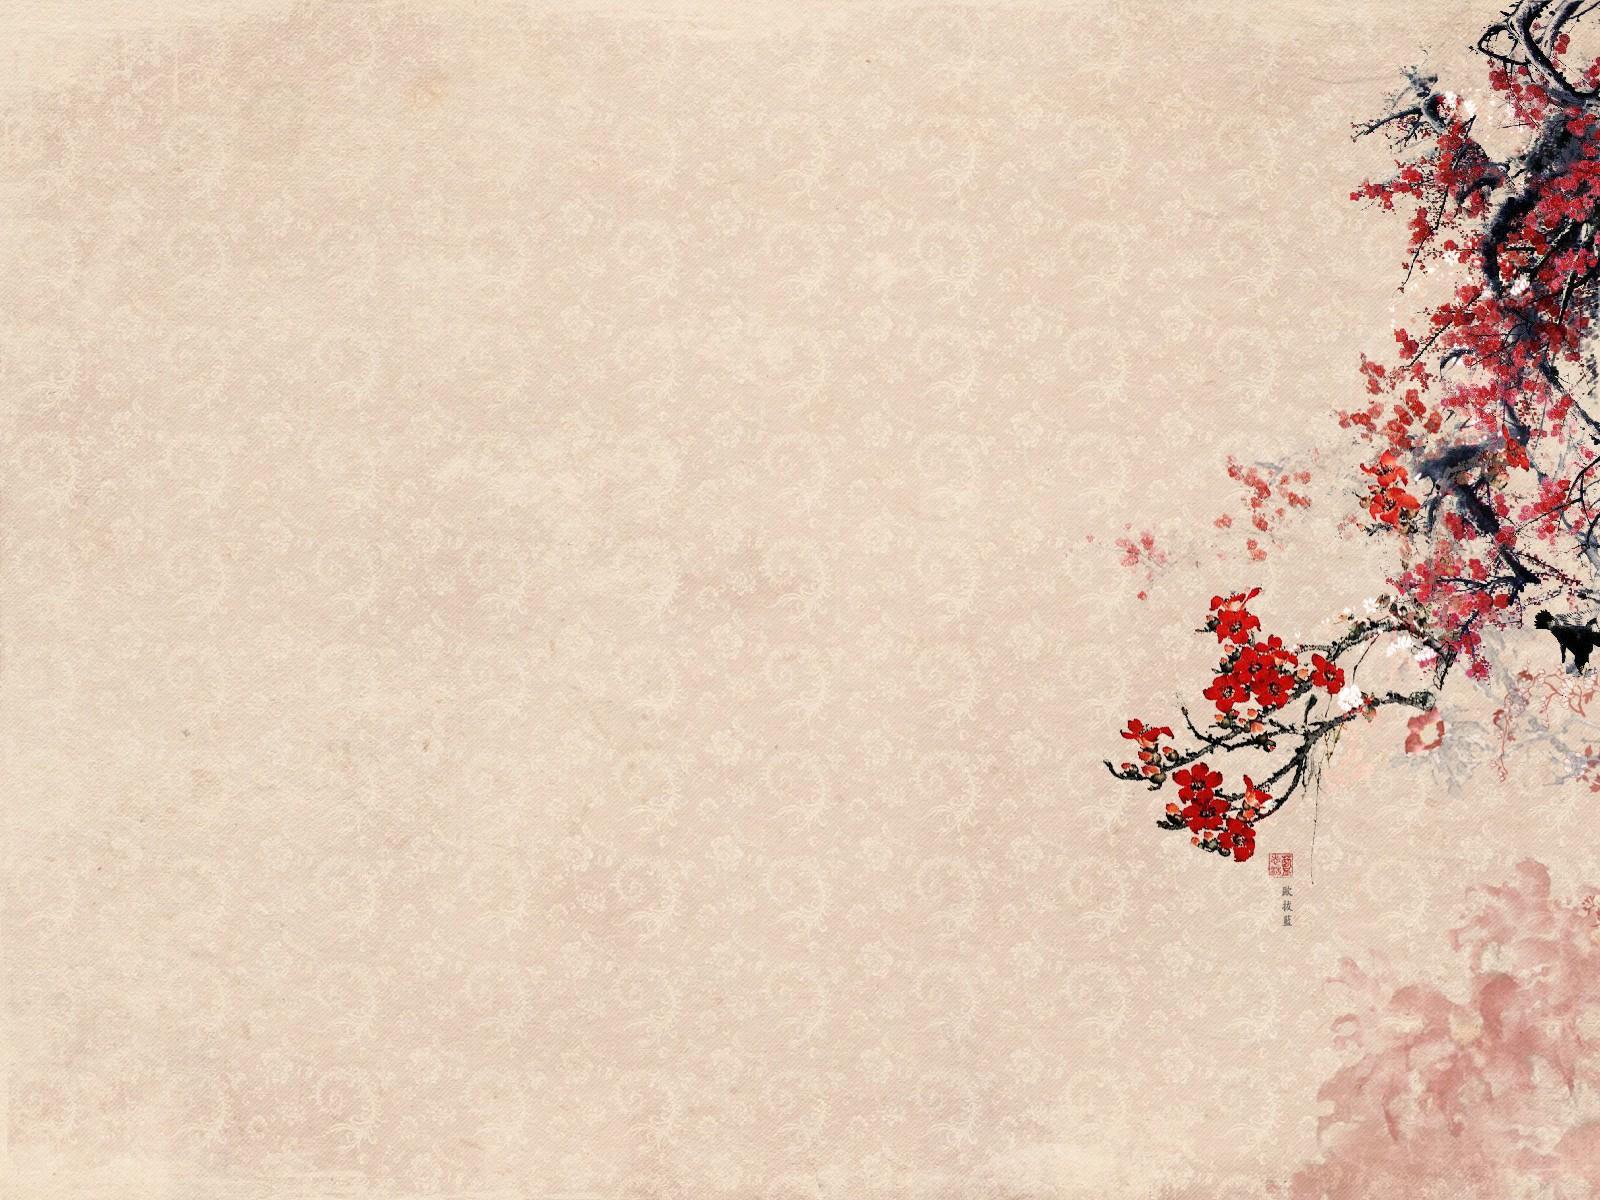 Kabekaminet 壁紙イラスト 随時更新和風な桜のイラスト